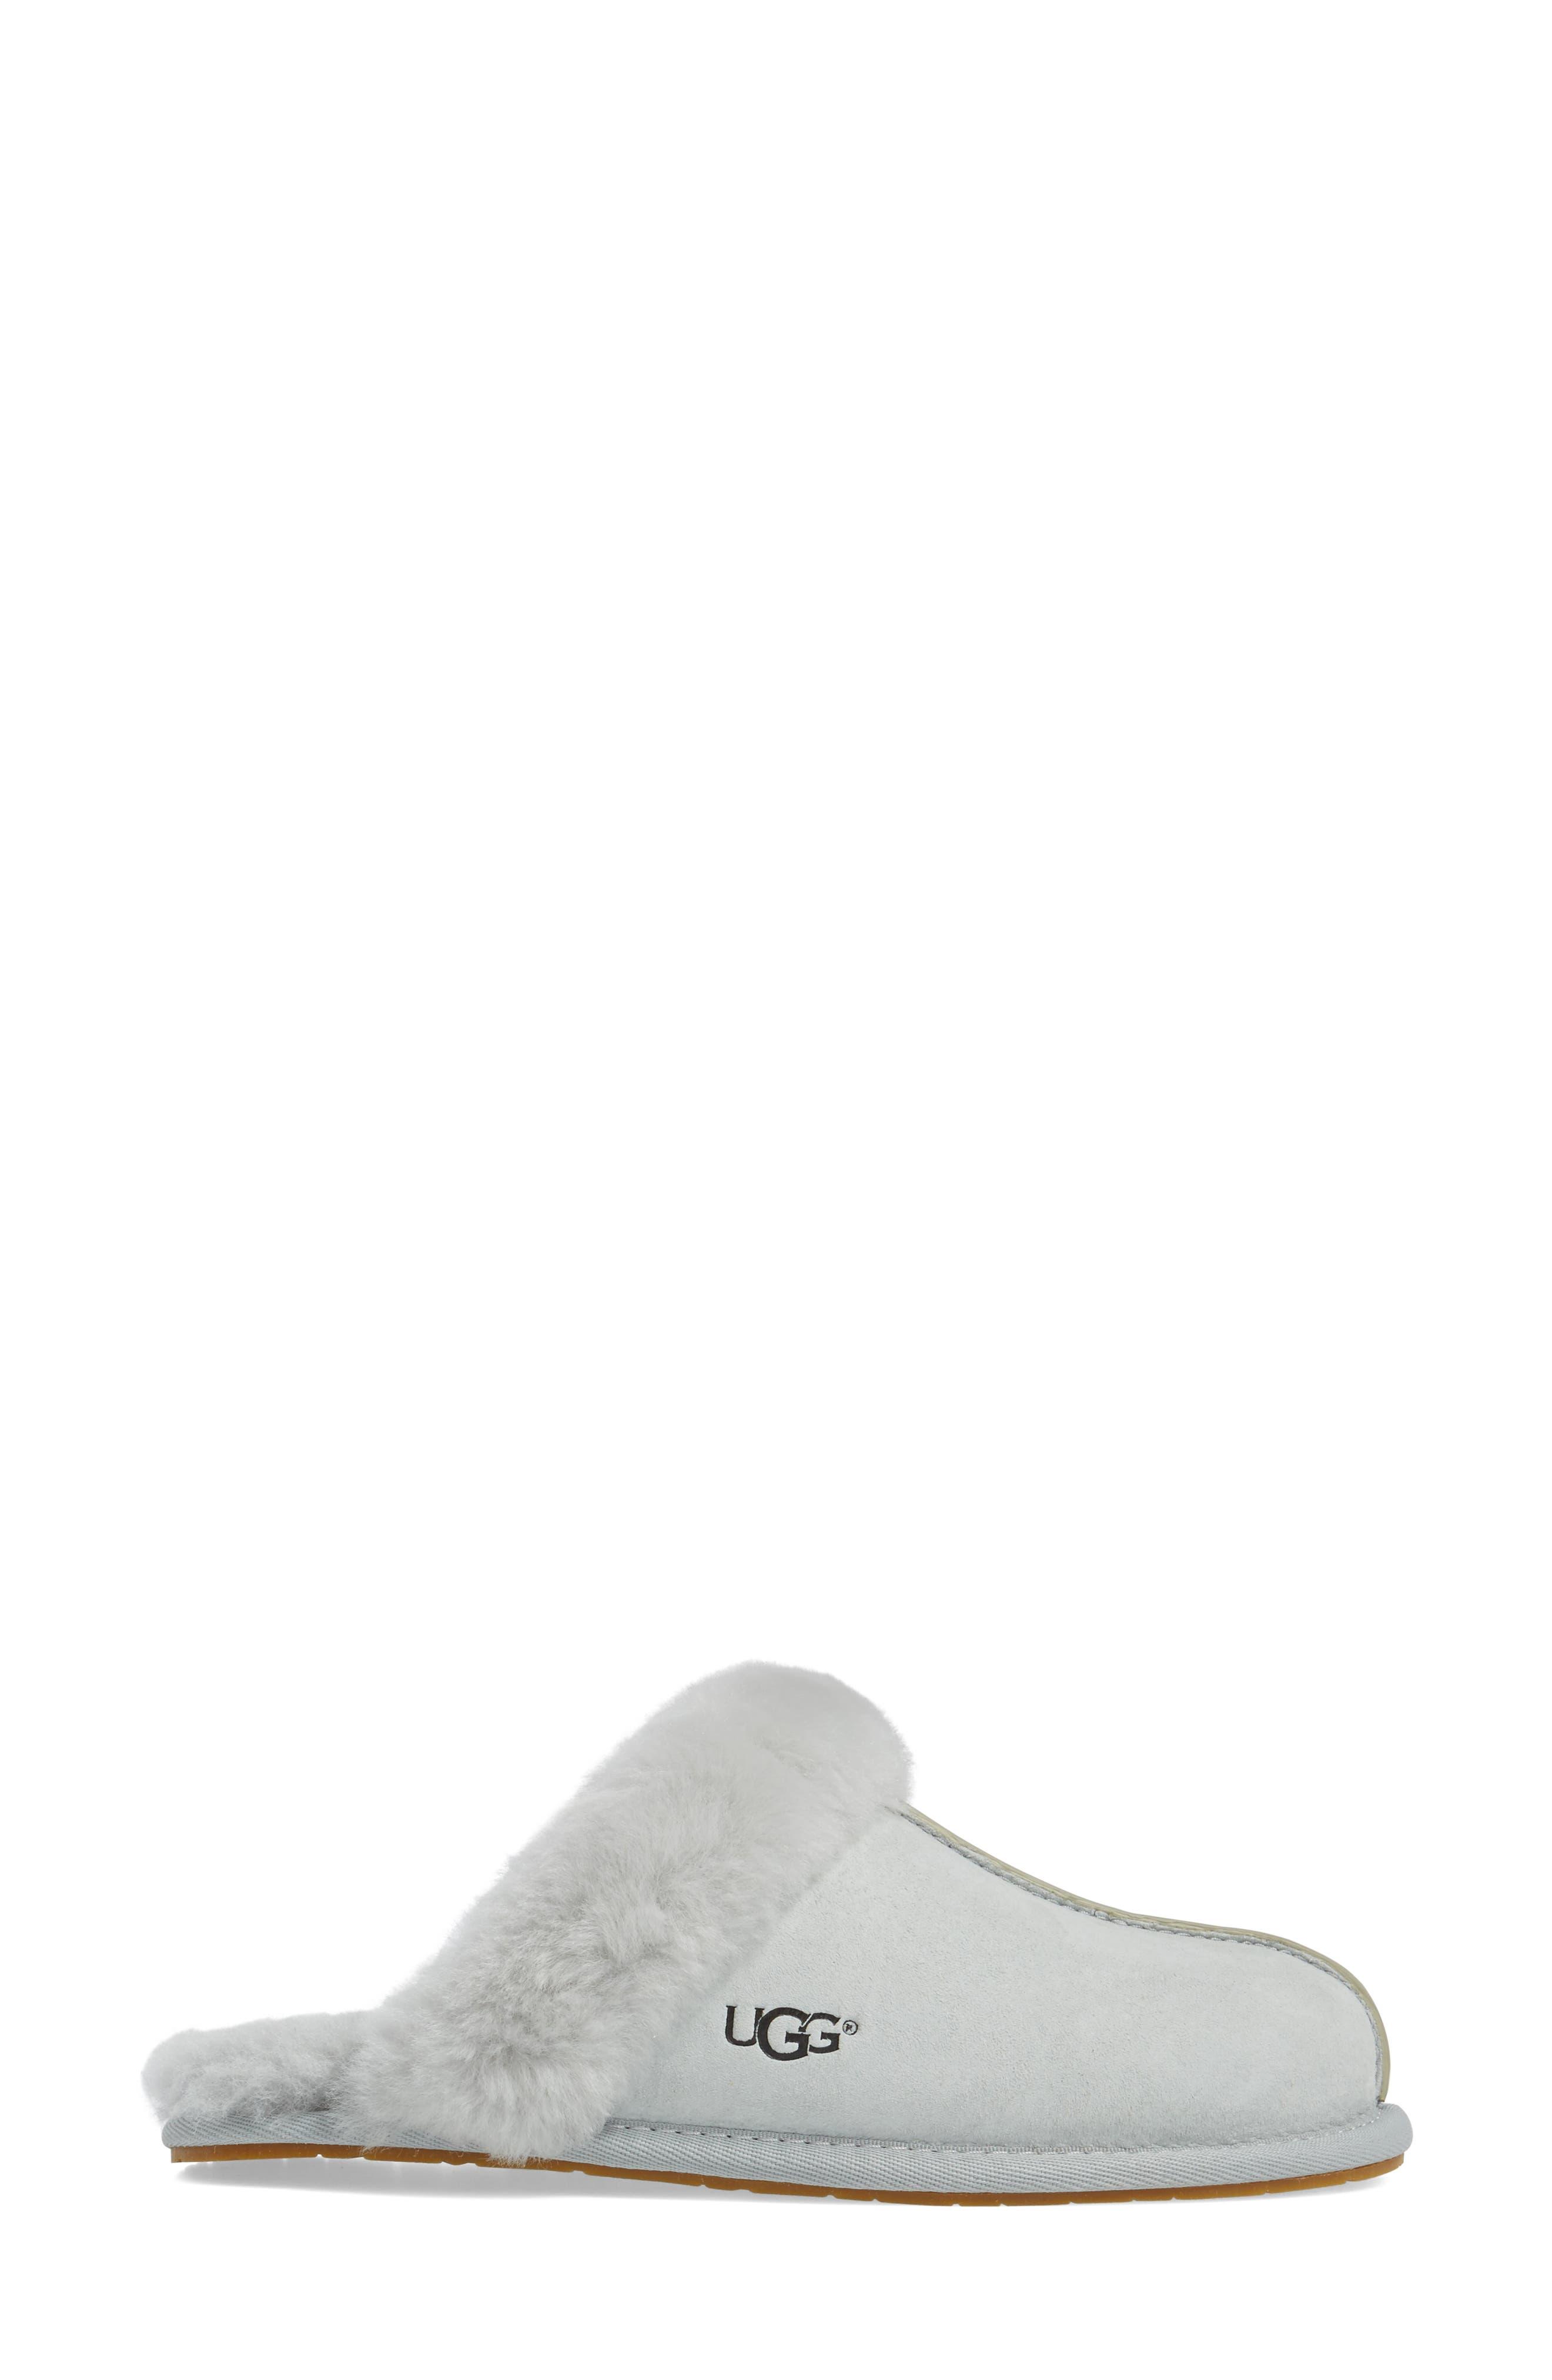 Alternate Image 3  - UGG® Scuffette II Slipper (Women)